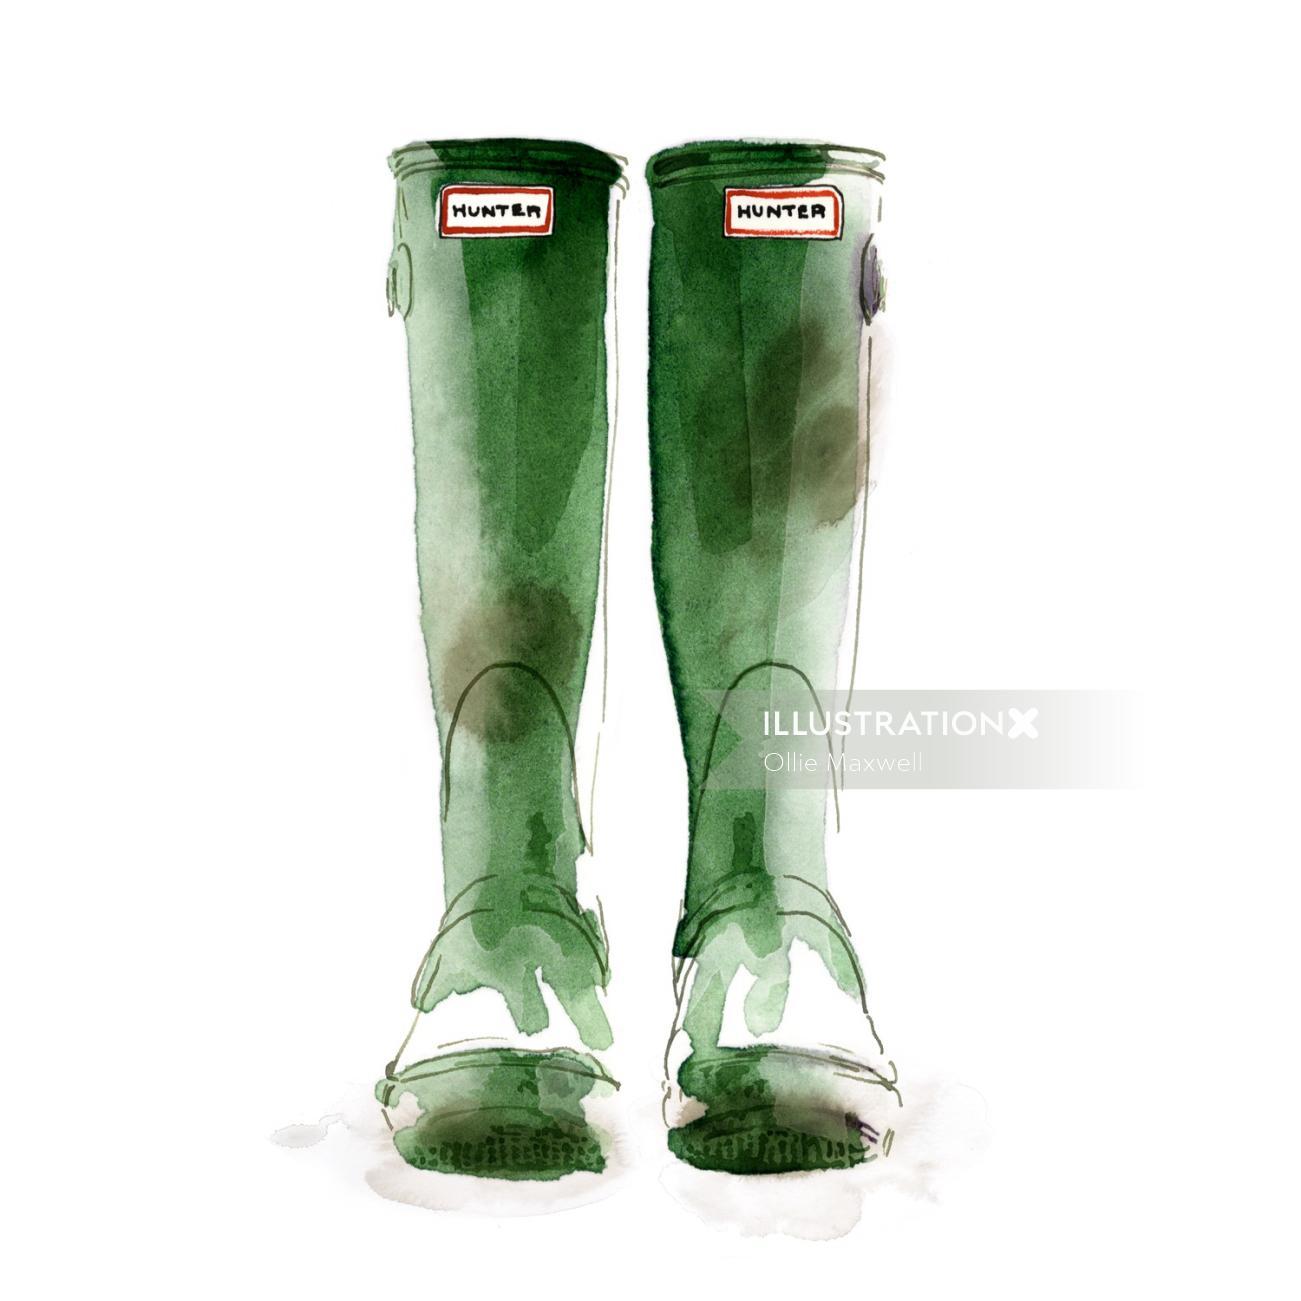 watercolor art of Wellingtons hunter boots